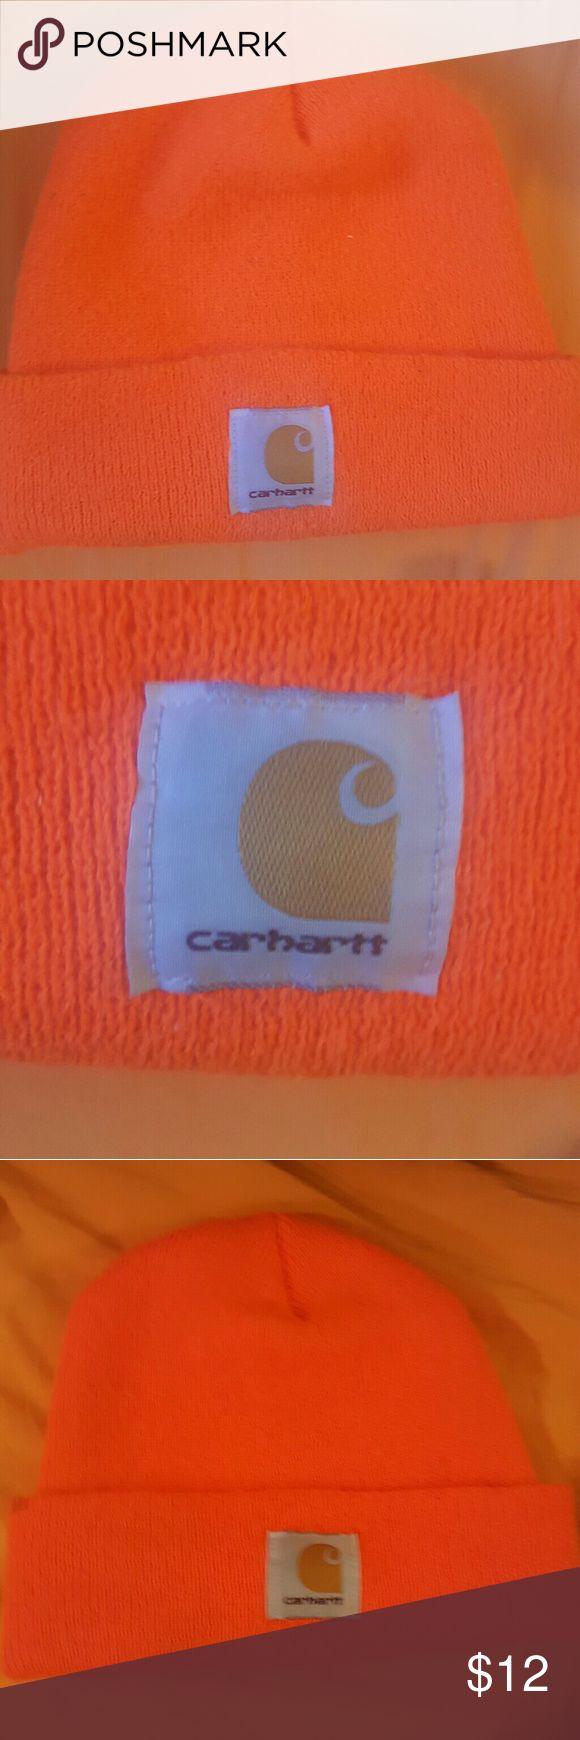 Bright Orange CARHARTT hunting hat like new!!! Bright Orange CARHARTT hunting hat like new!!! SUPER WARM!!! Carhartt Accessories Hats